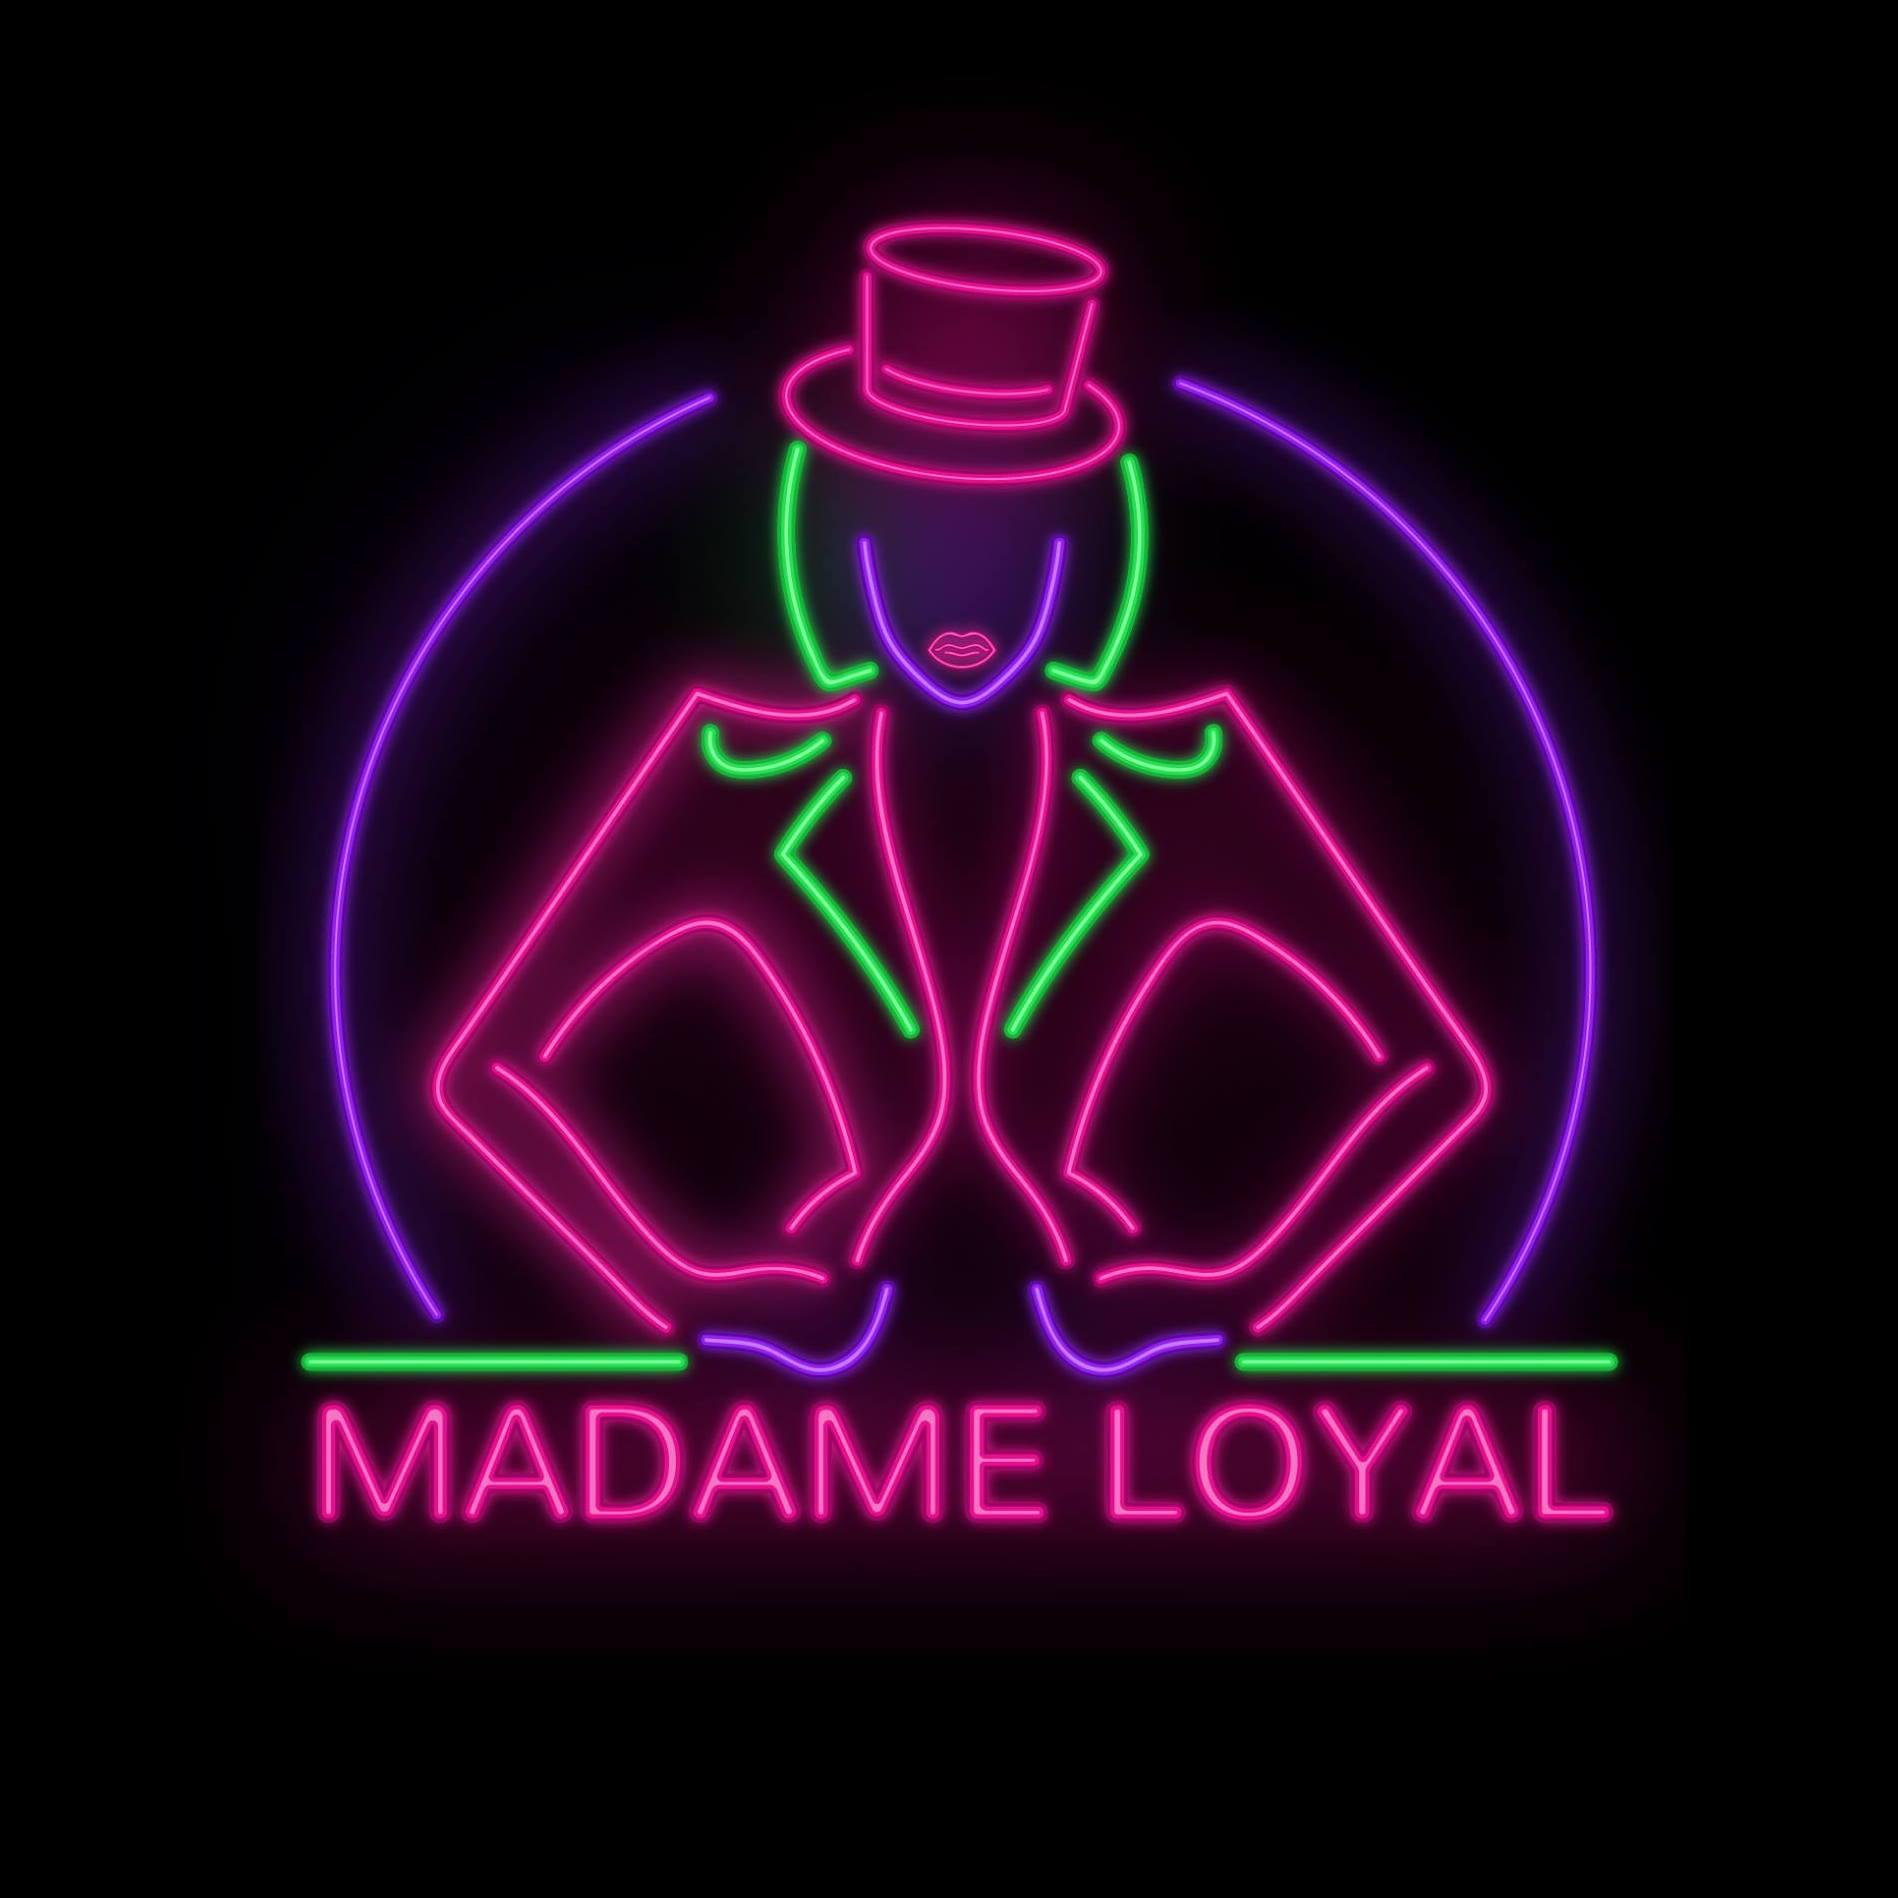 logo Madame Loyal